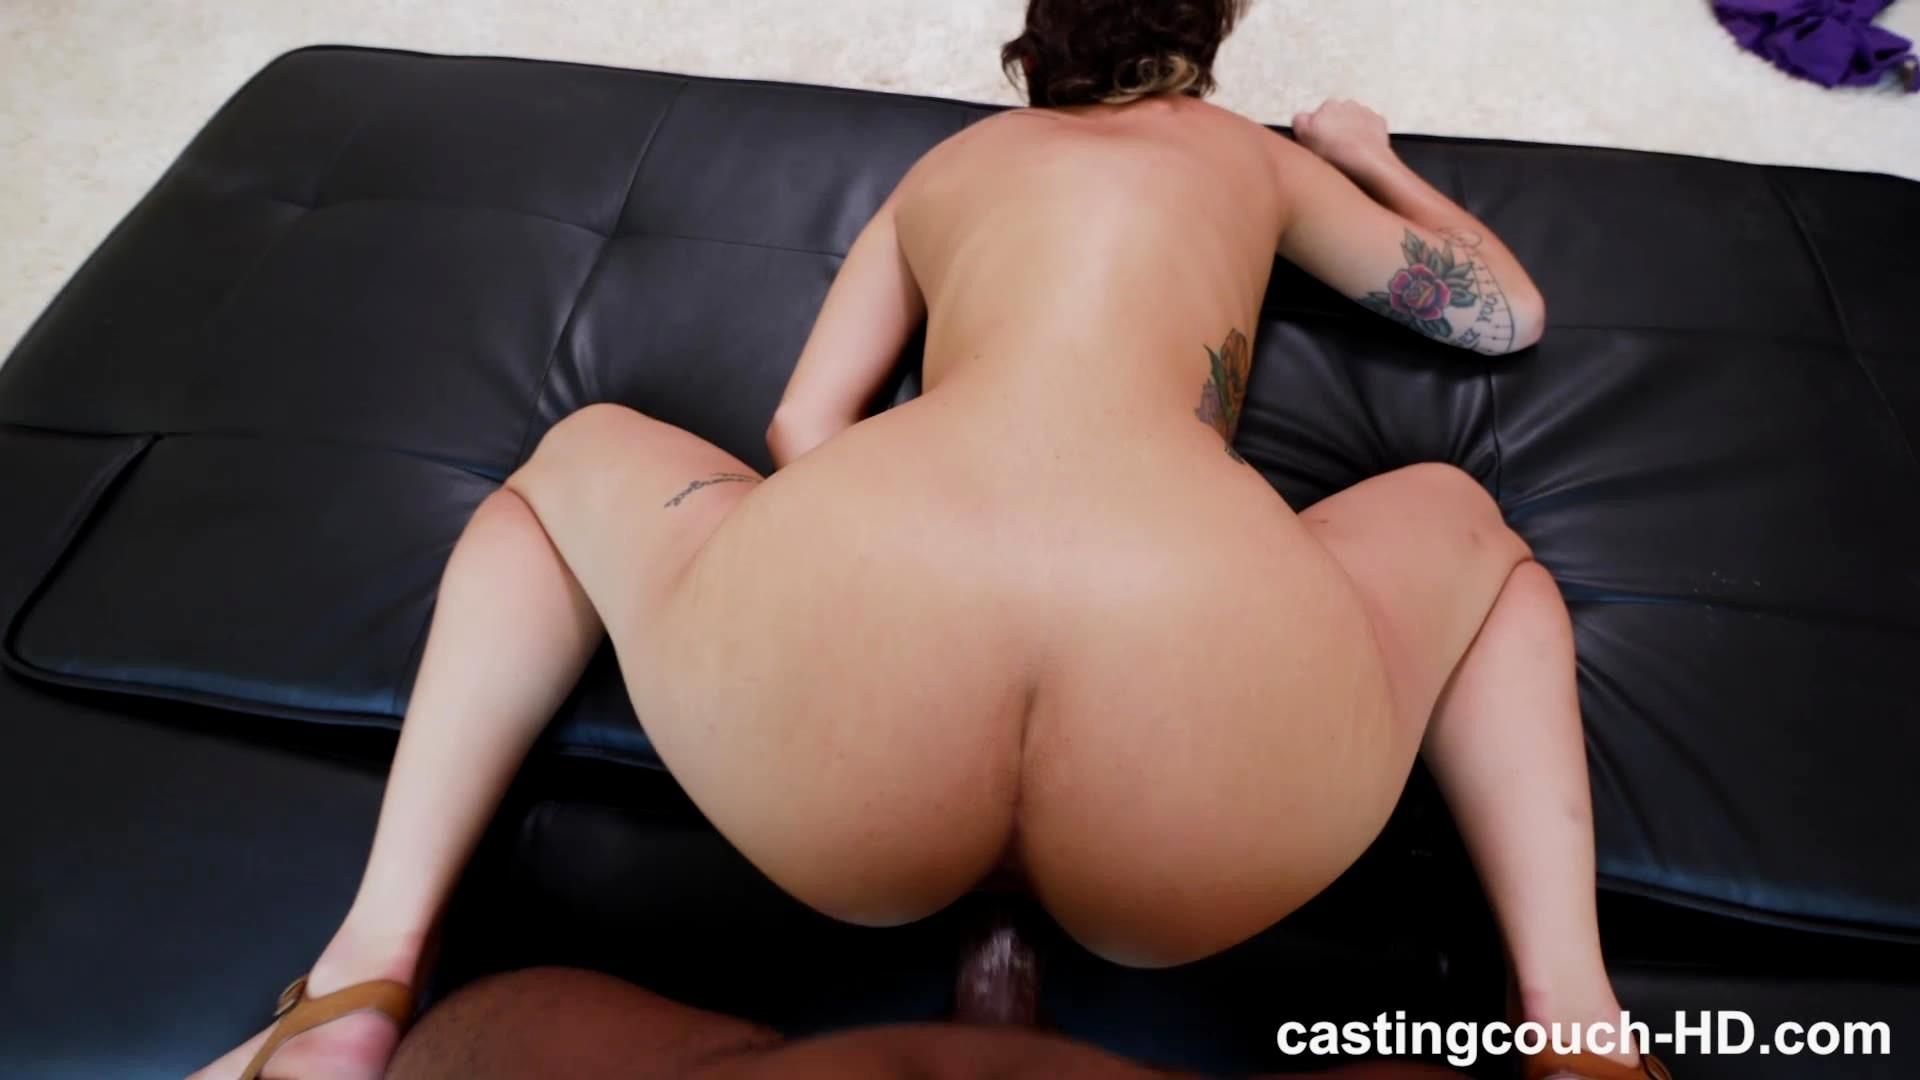 pov casting couch 4